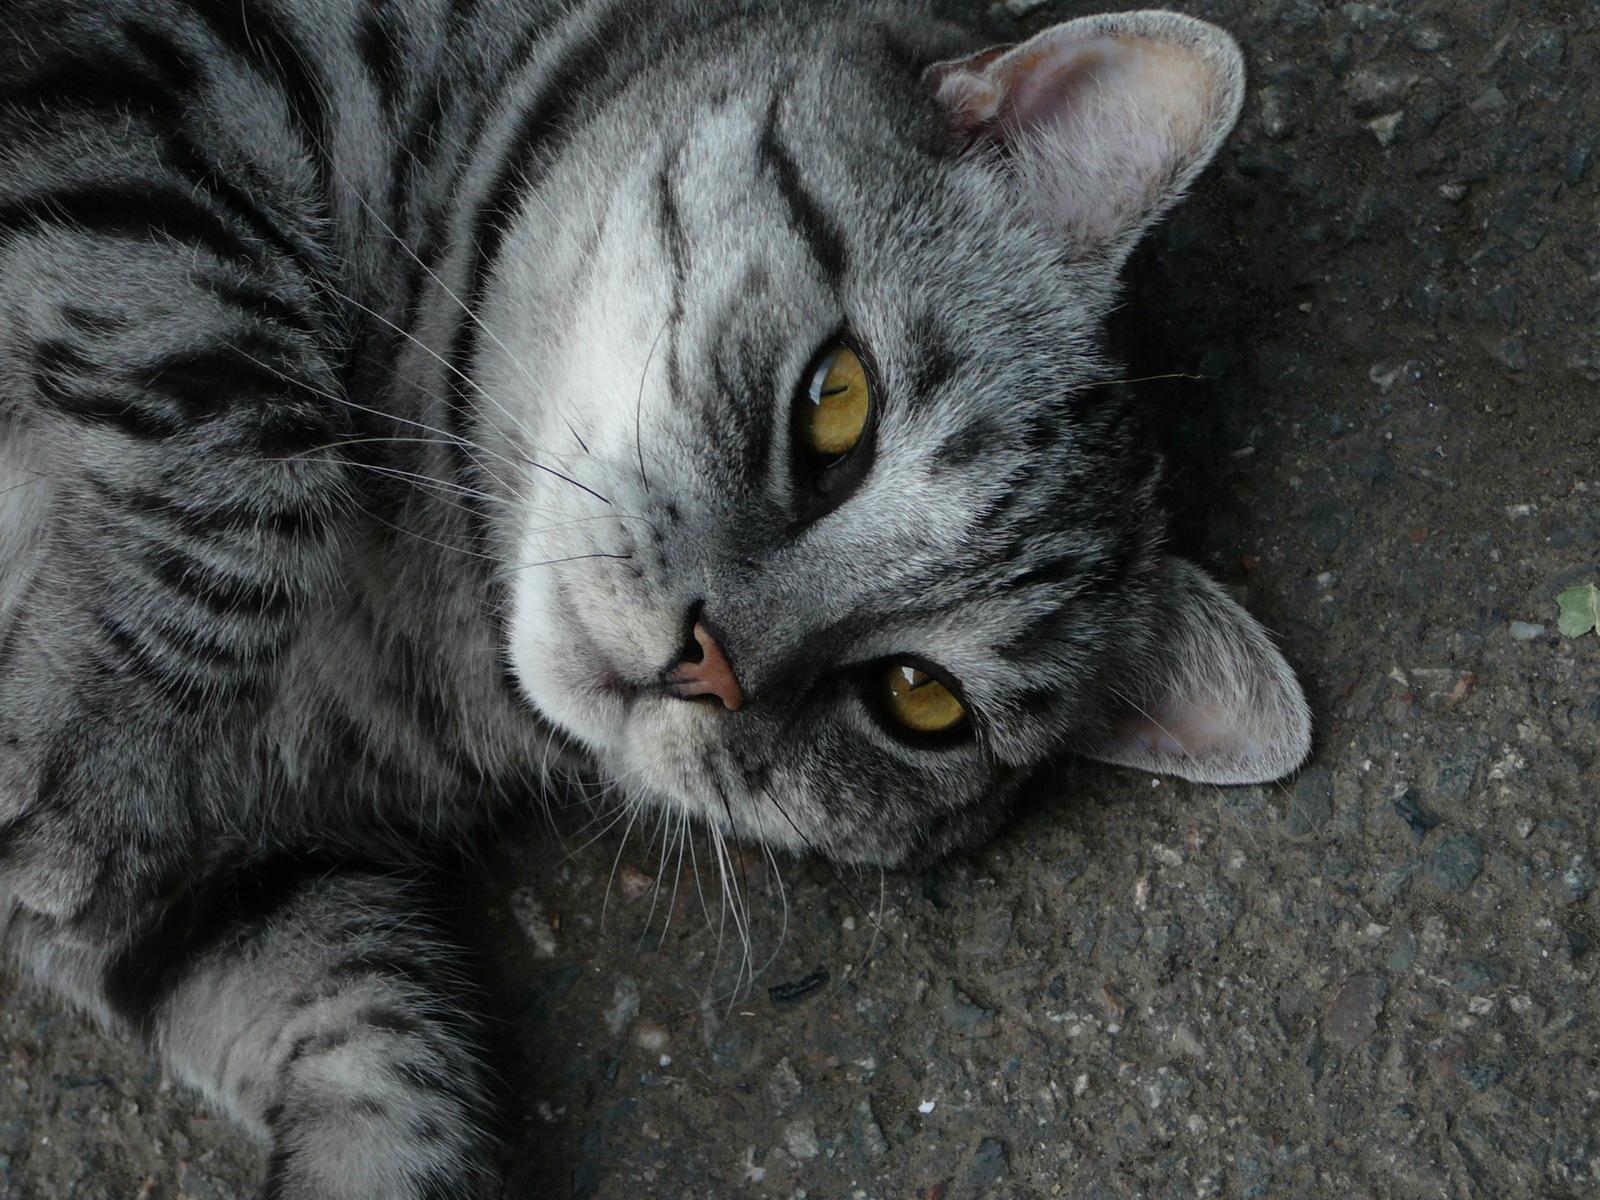 kittens for sale colorado springs